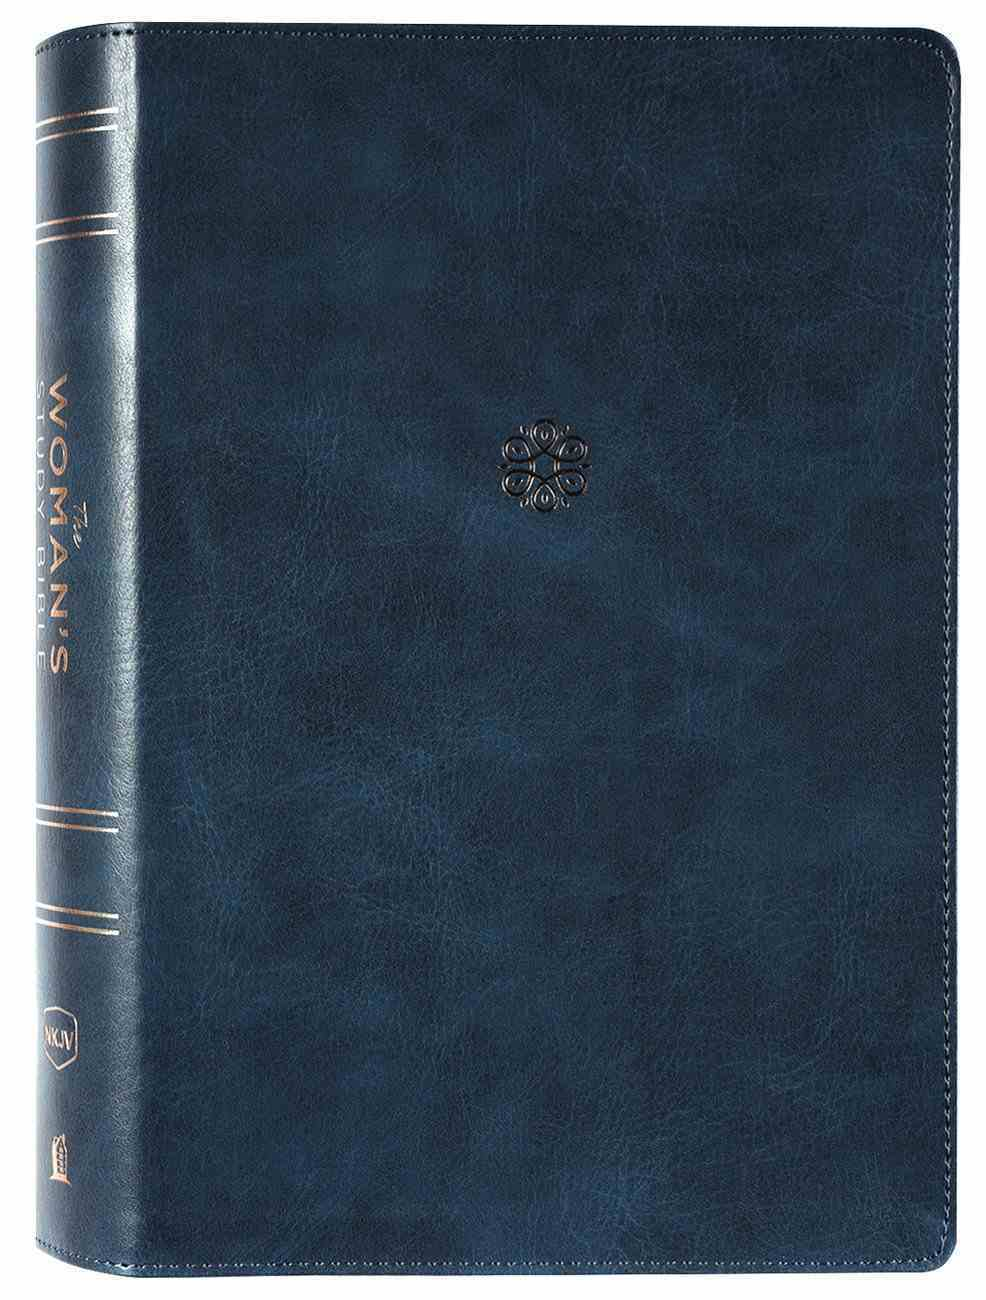 NKJV the Woman's Study Bible Blue Premium Imitation Leather